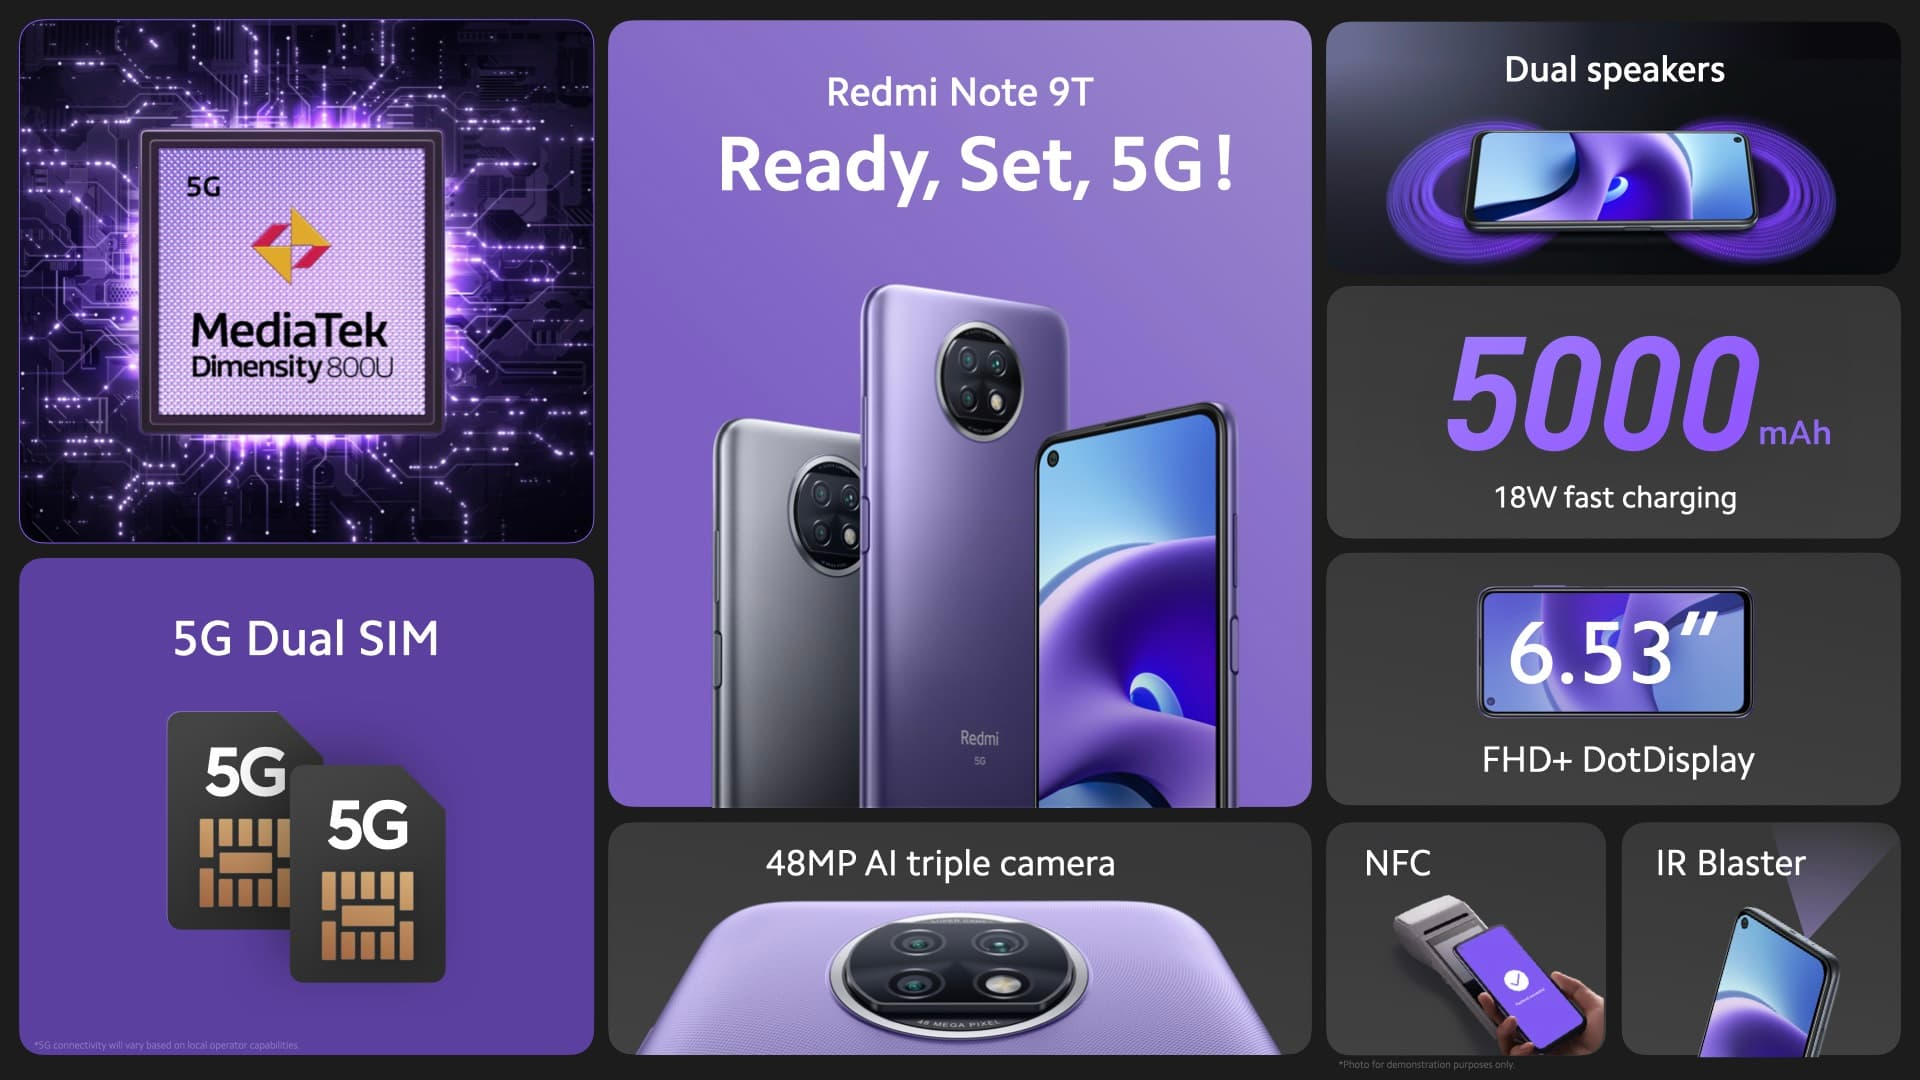 Redmi Note 9T z modemem dual sim 5G